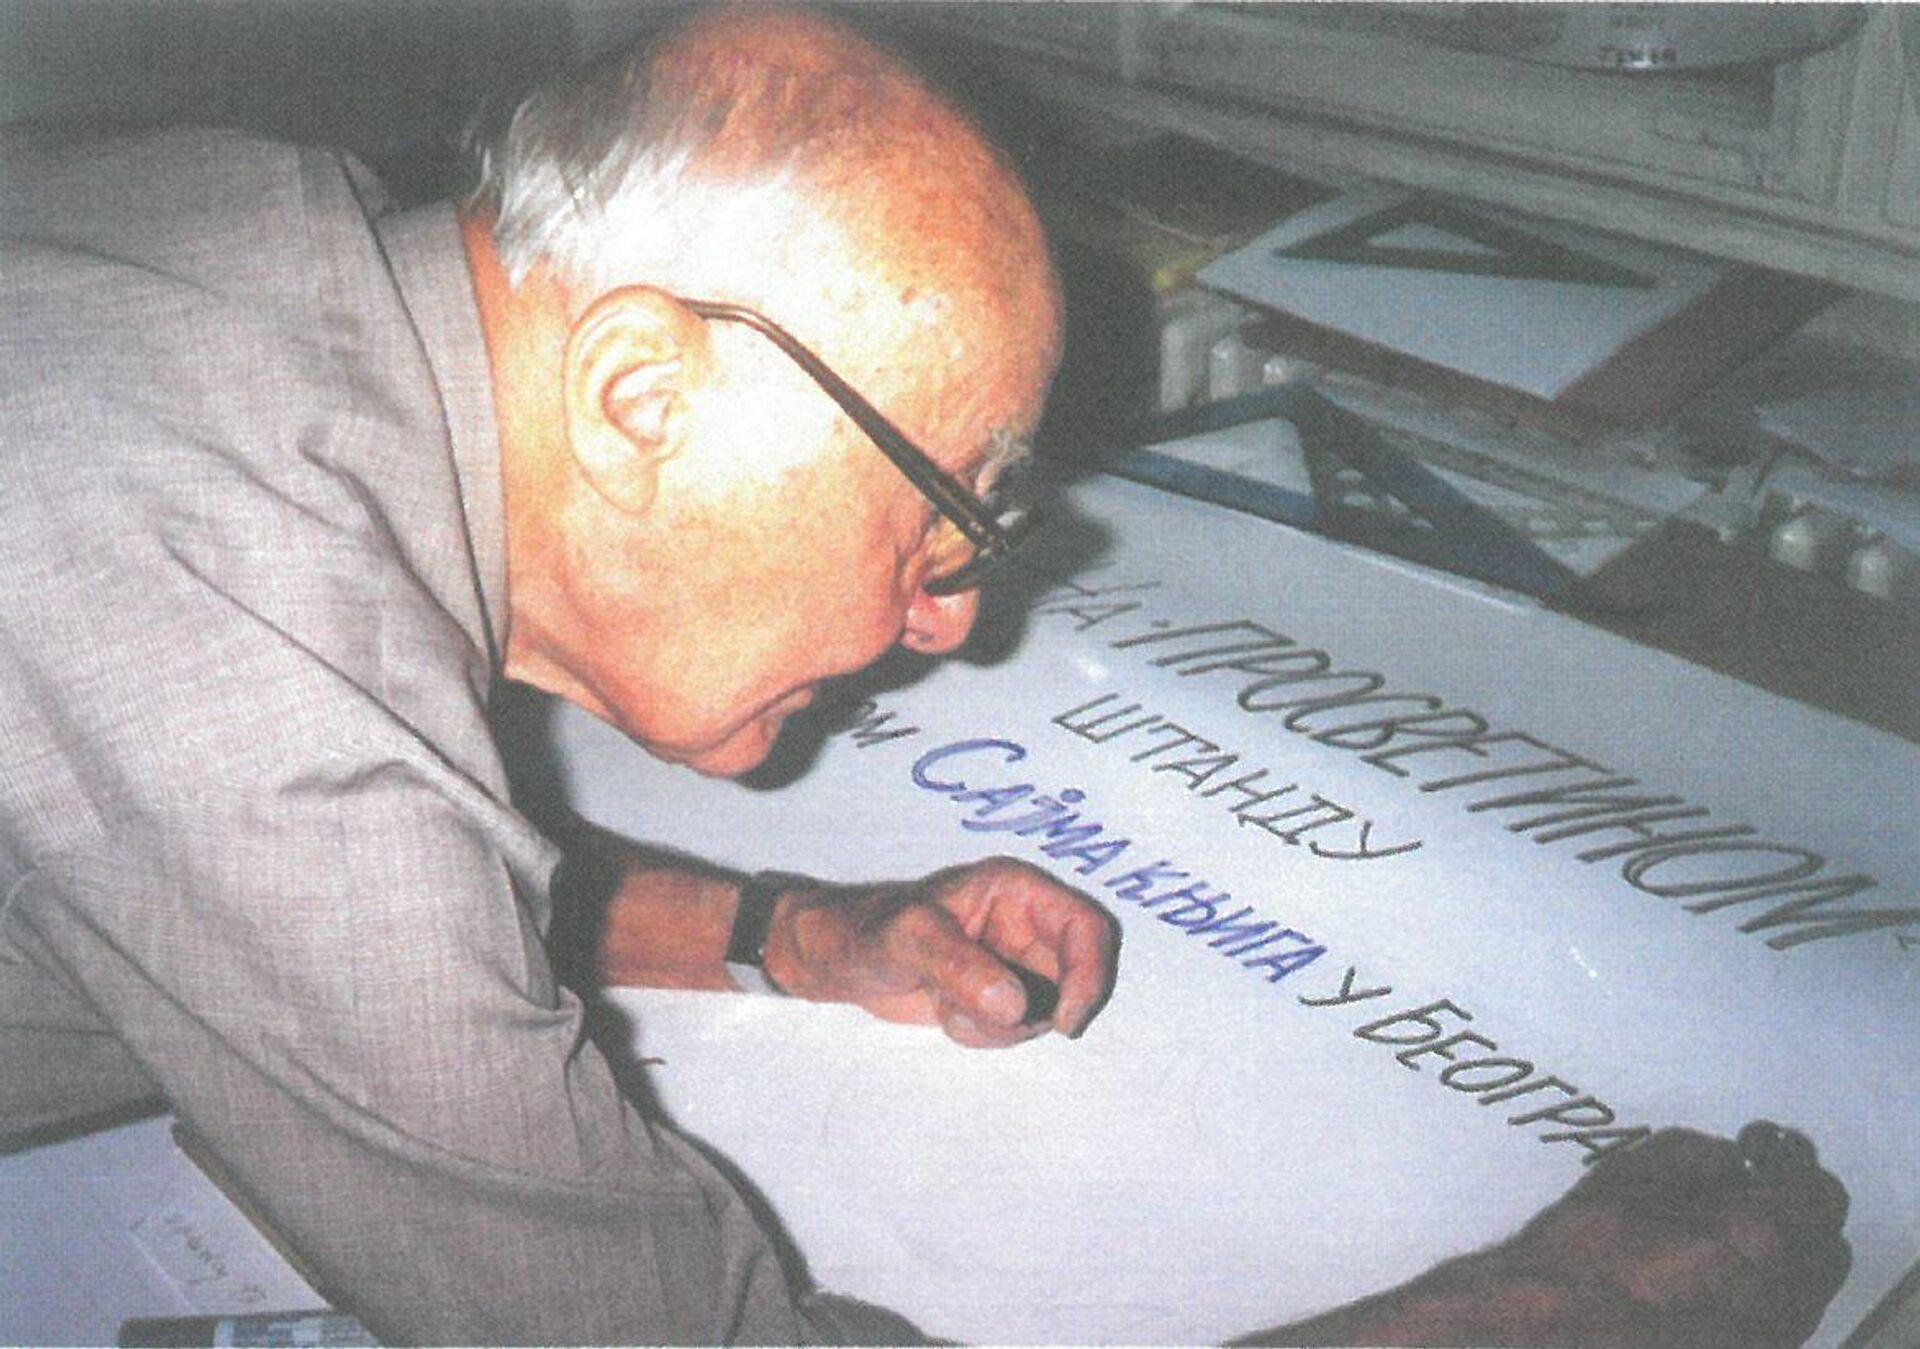 Đorđe Lobačev u Prosveti 1997. godine - Sputnik Srbija, 1920, 08.09.2021